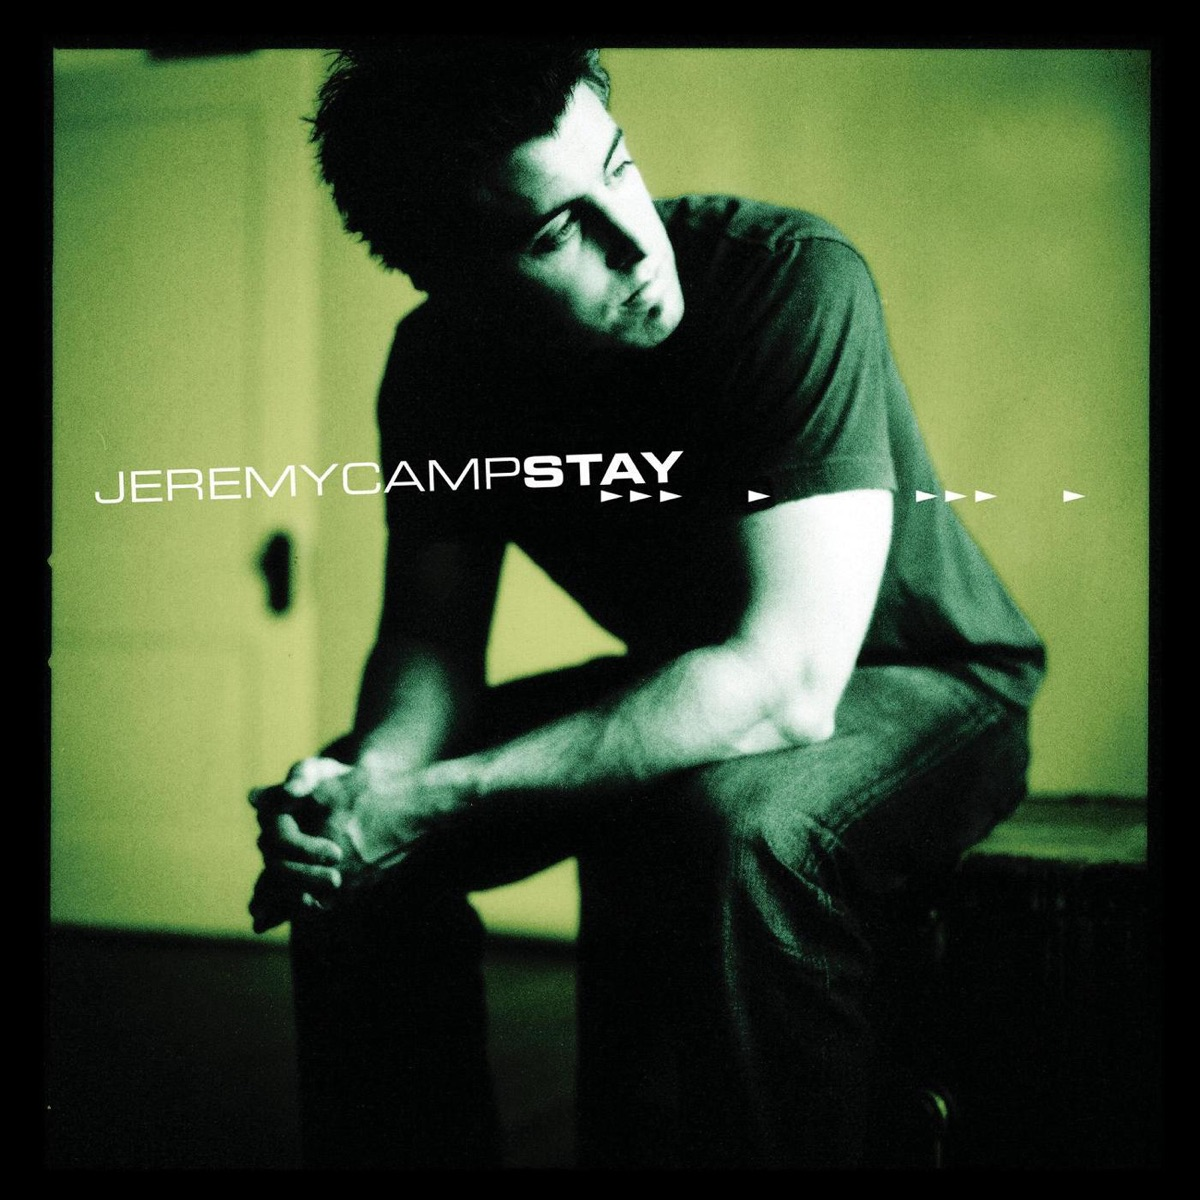 Stay Jeremy Camp CD cover